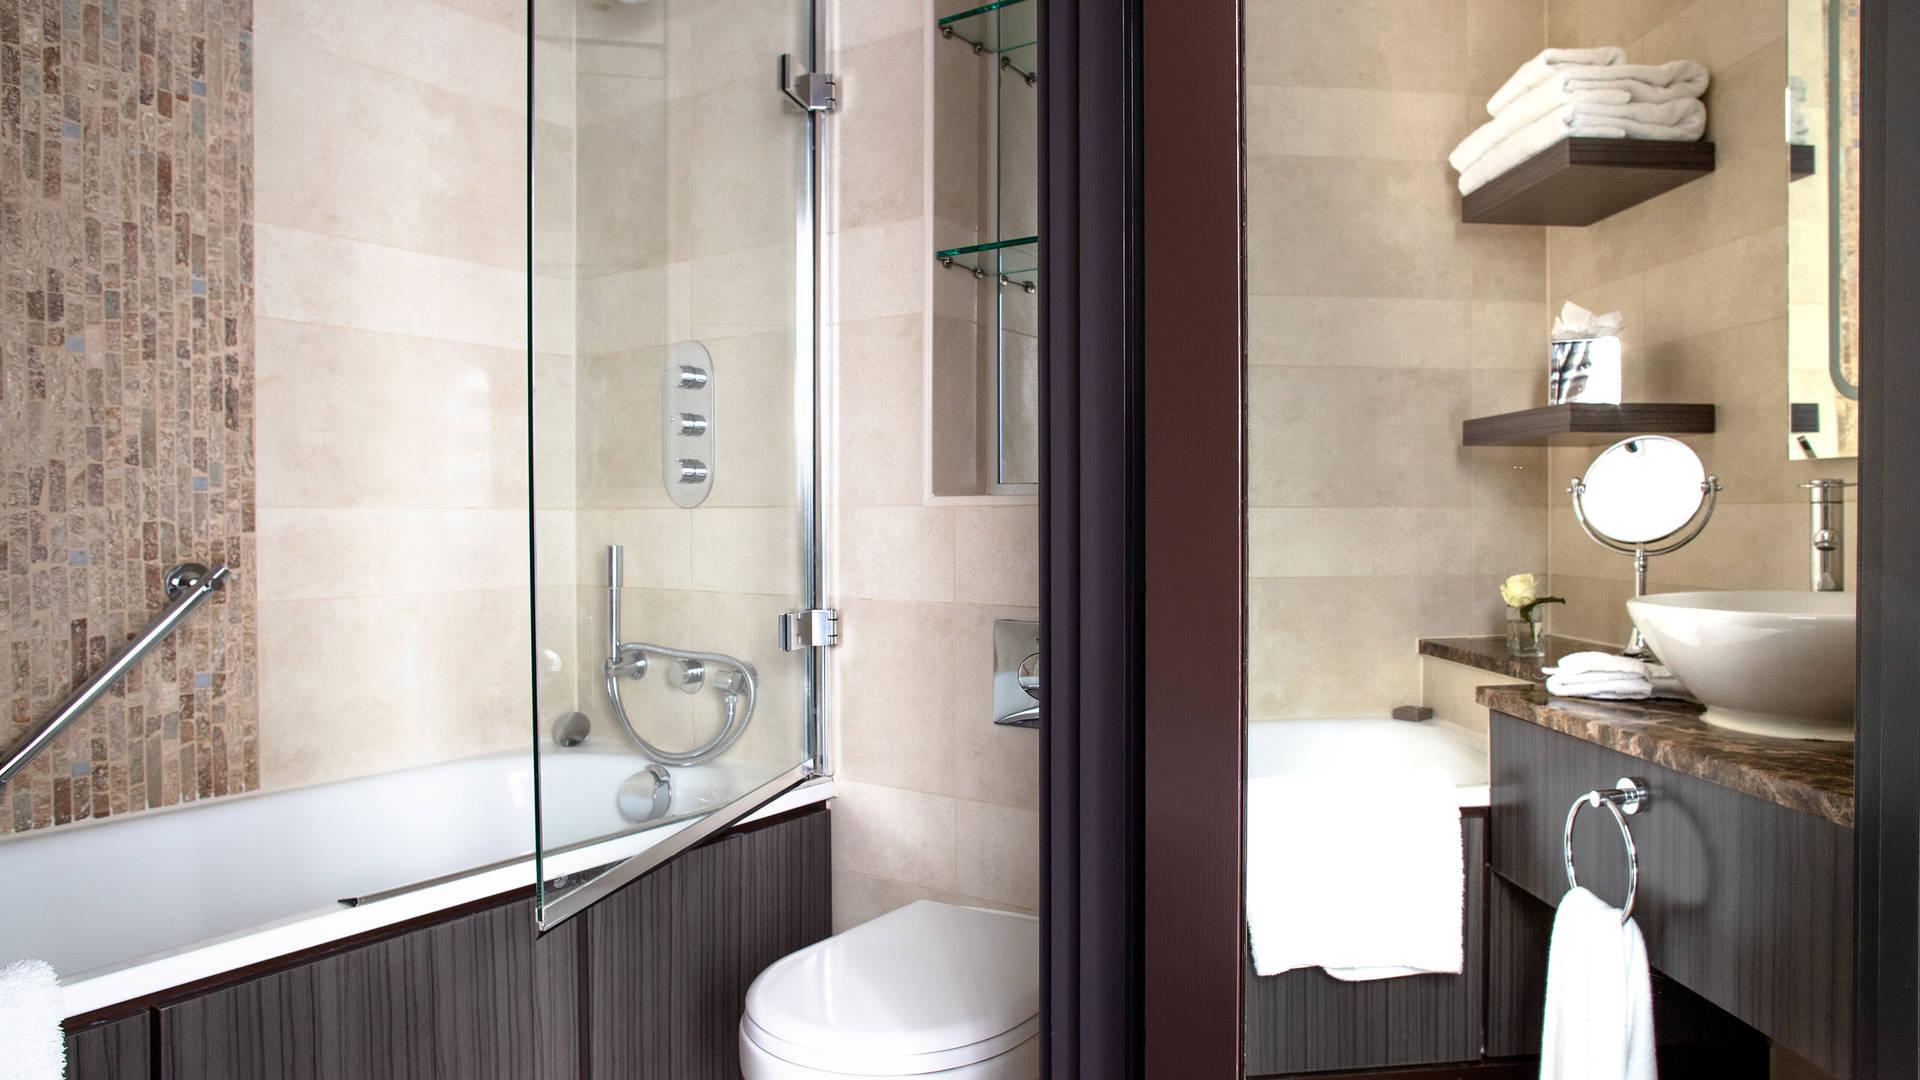 Bathroom-Deluxe-Room-Jumeirah-Lowndes-Hotel